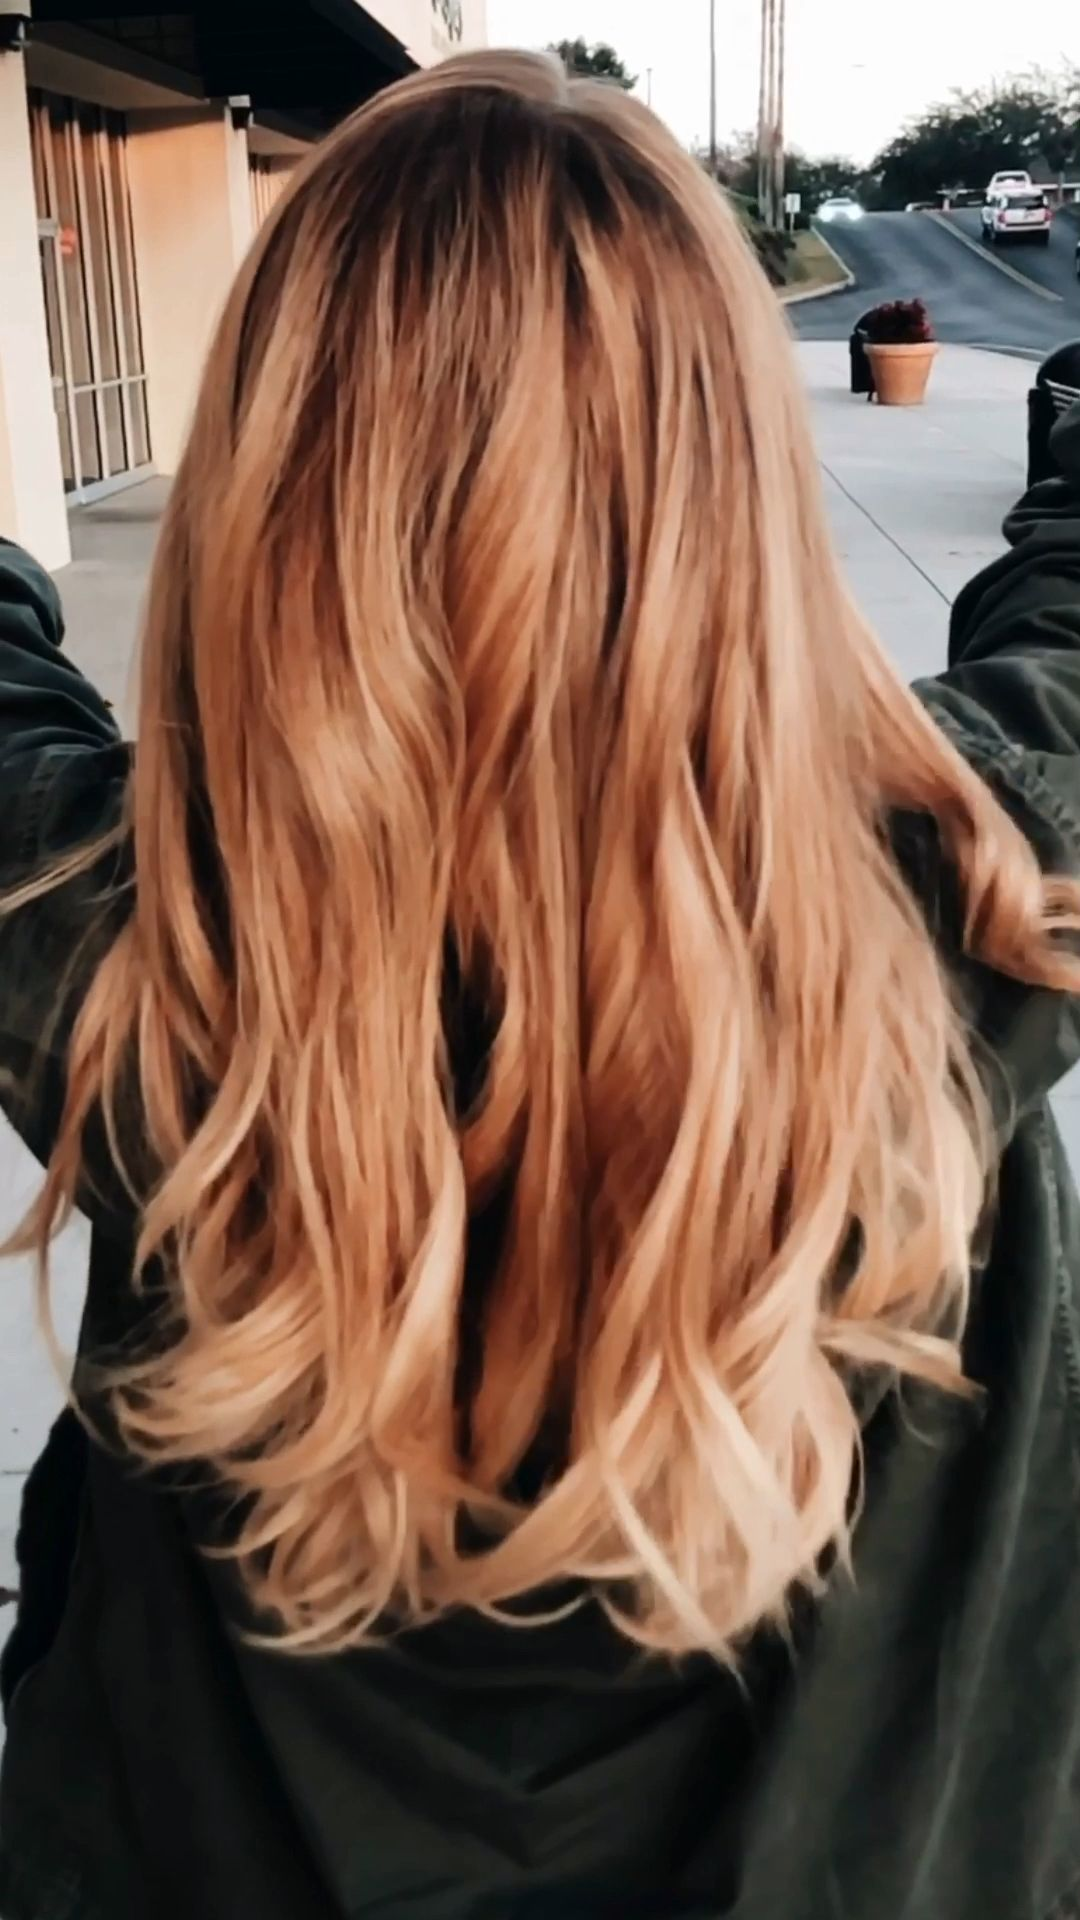 Strawberry Blonde Balayage Katelyn Adair Video Strawberry Blonde Hair Color Strawberry Blonde Hair Medium Length Hair Styles